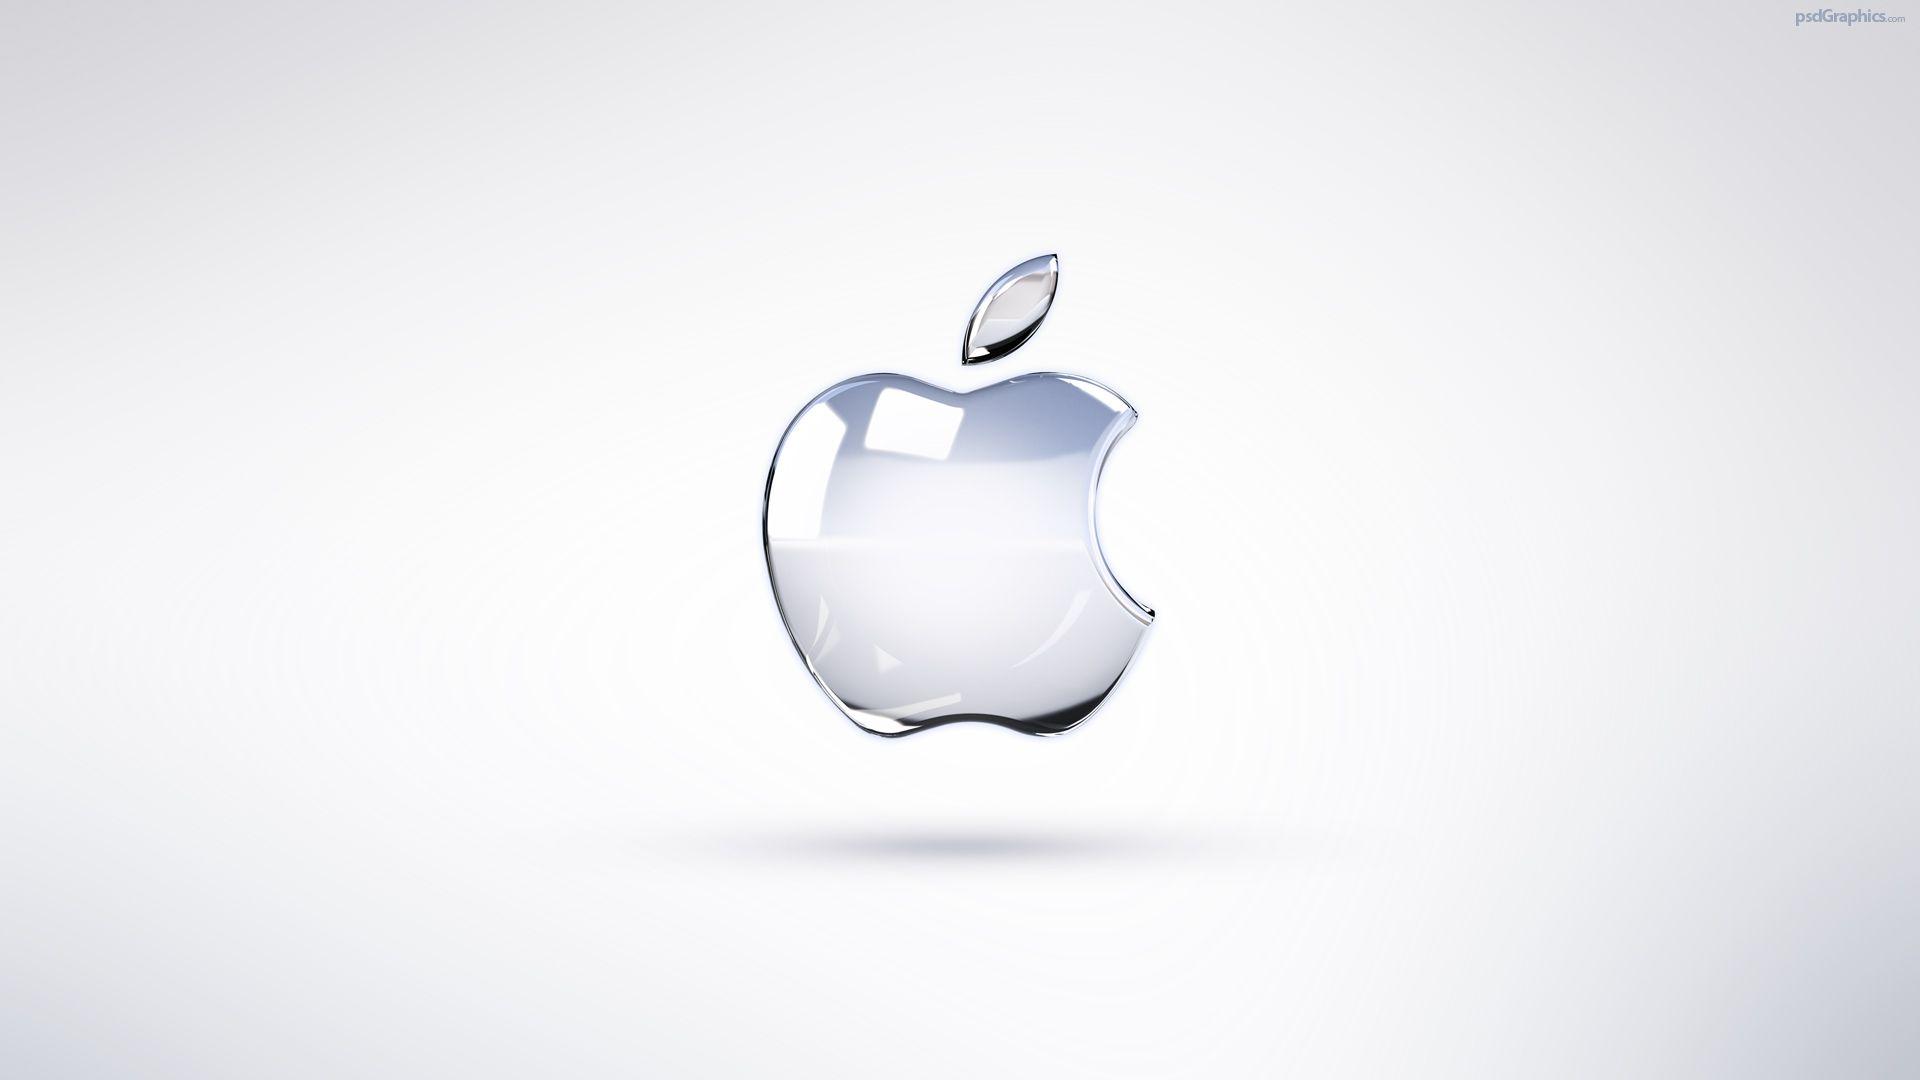 Apple Desktop Backgrounds Christmas 1920x1920 120 Views Apple 1920x1080